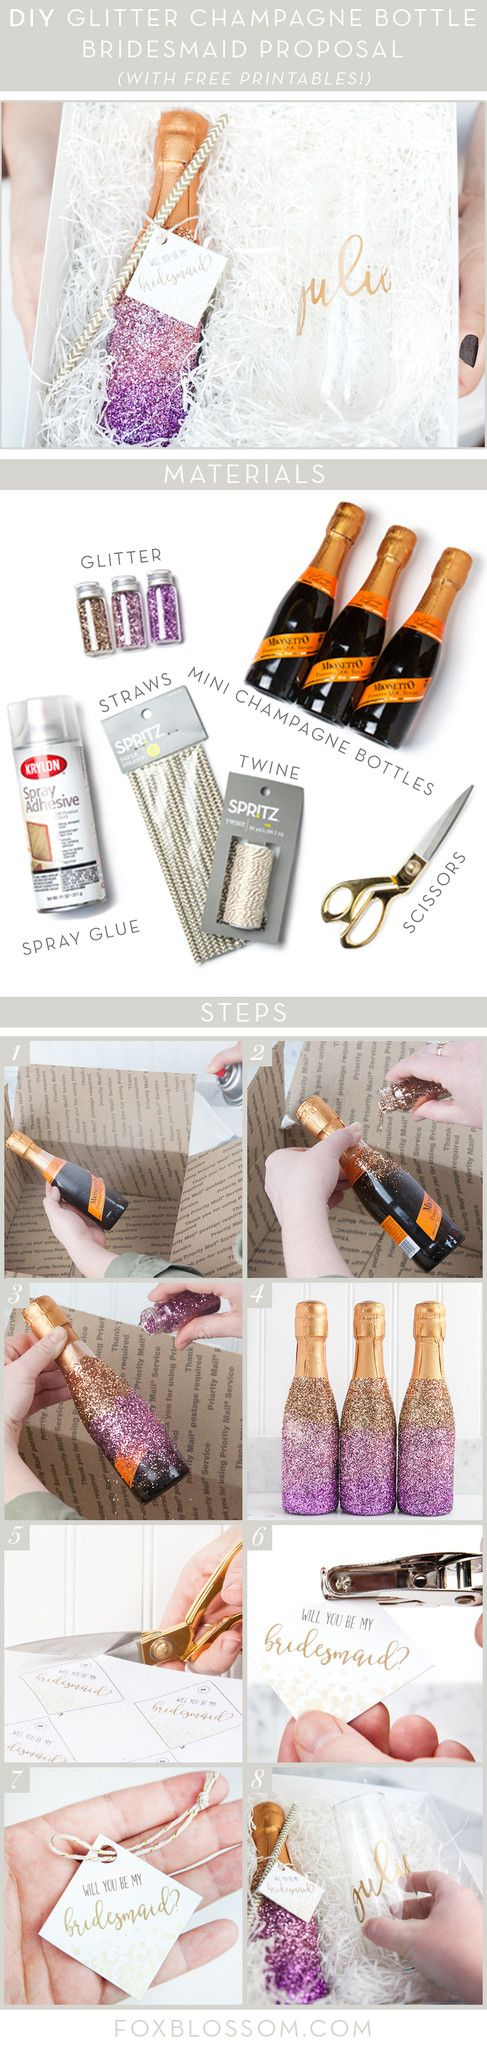 DIY Glitter Champagne Bridesmaid Proposal! More